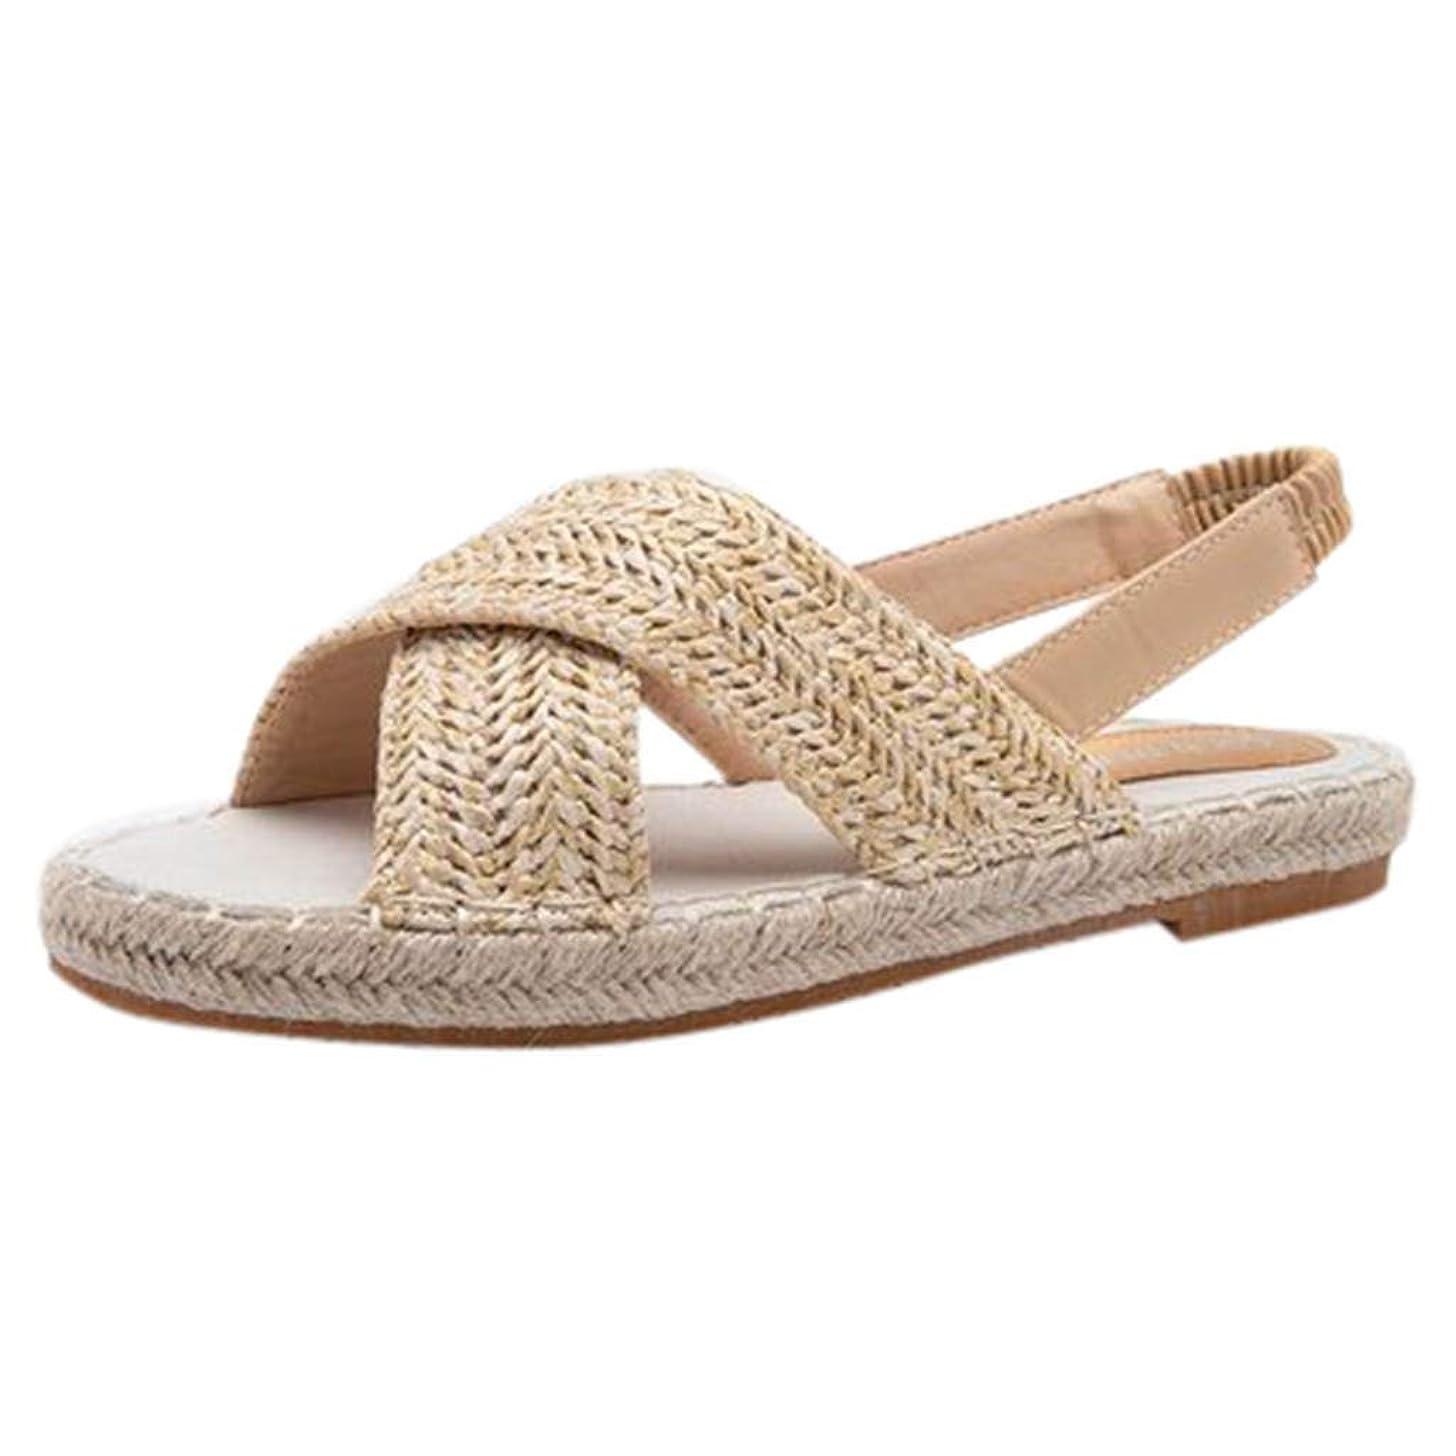 Women's Fashion Espadrilles Cross Strap Beach Casual Woven Beach Walk Shoes Peep Toe Flat Roman Sandals JHKUNO